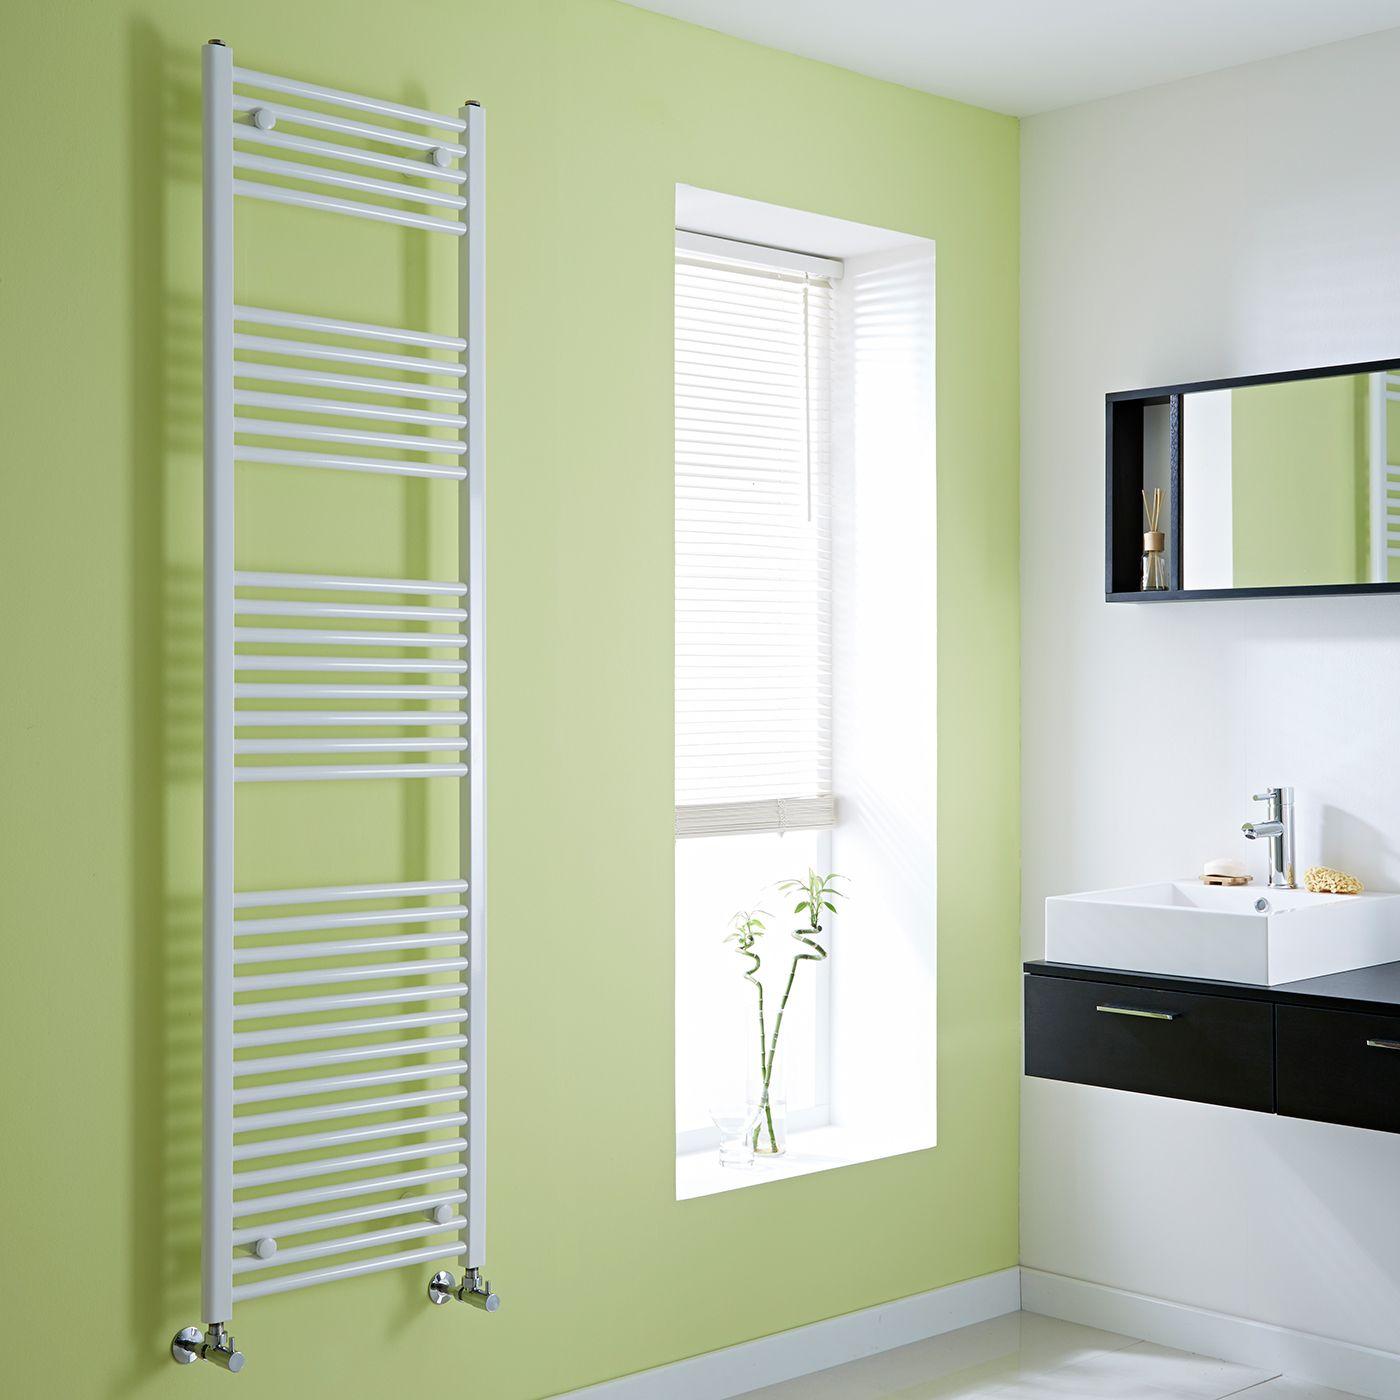 Large White Flat Heated Towel Rail